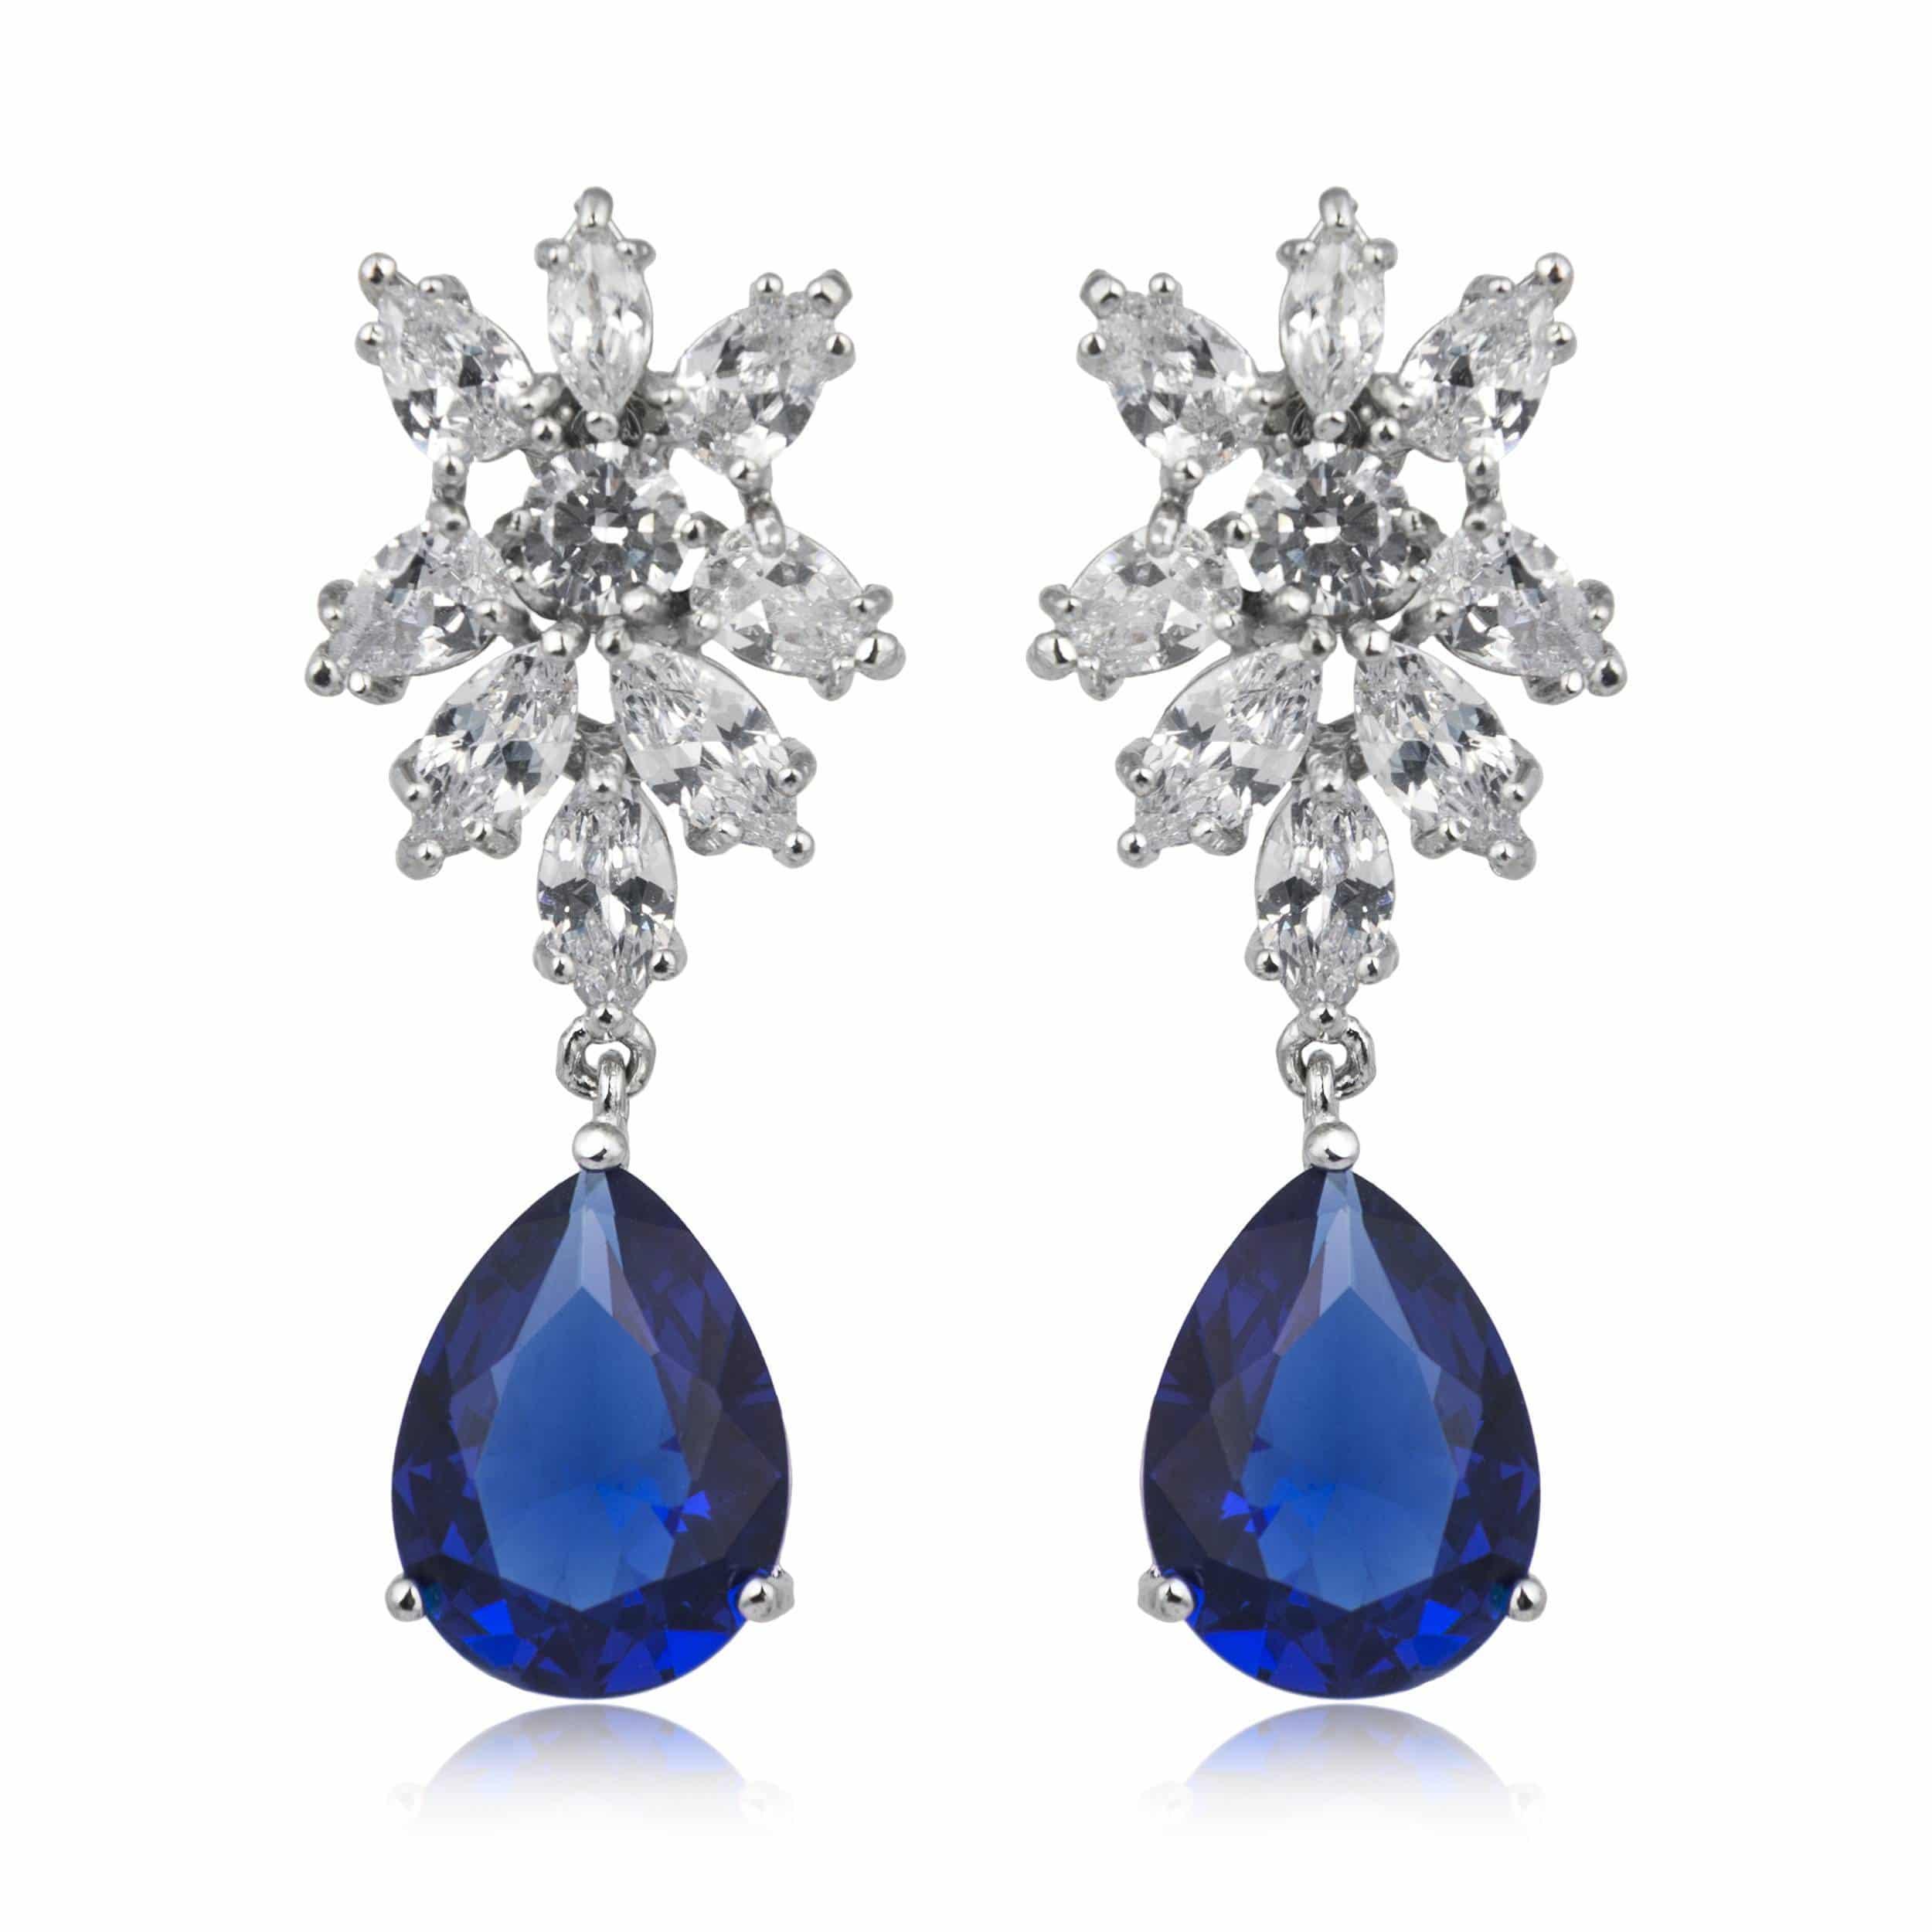 visu swarovski cristal unique creez - Cristal Swarovski : créez un bijou unique